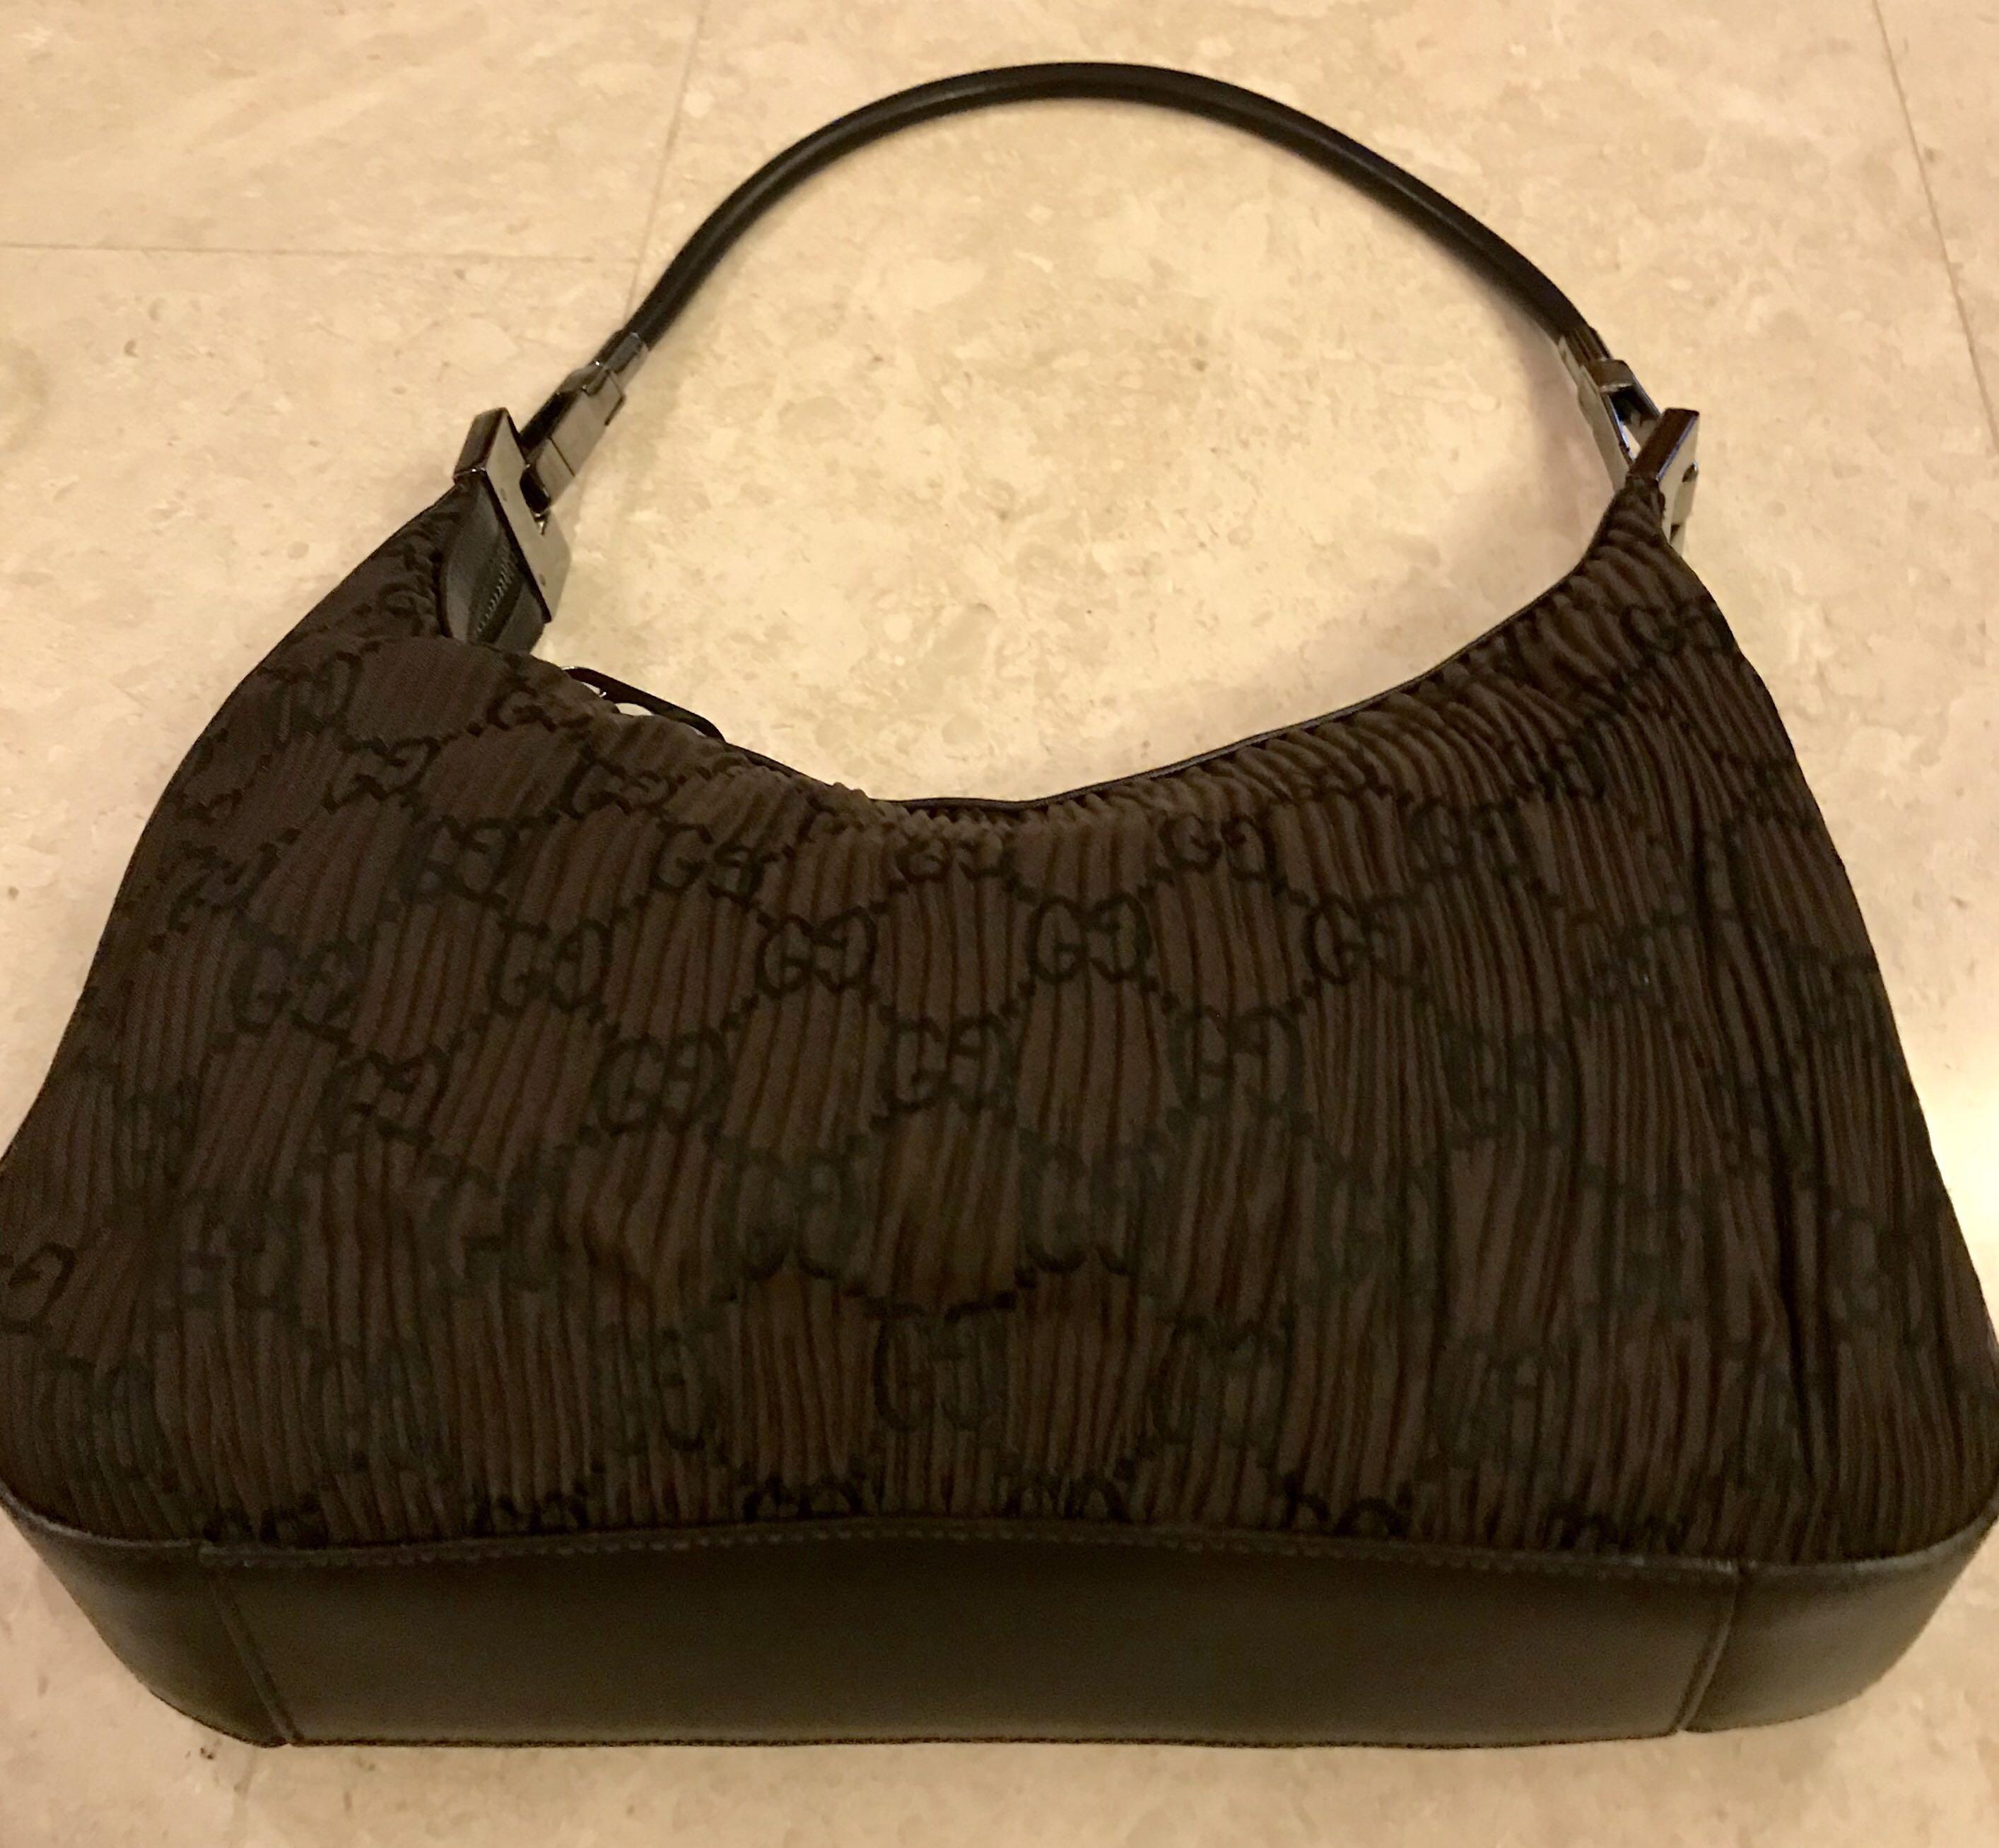 262010562 Preloved GUCCI handbag, Women's Fashion, Bags & Wallets, Handbags on ...